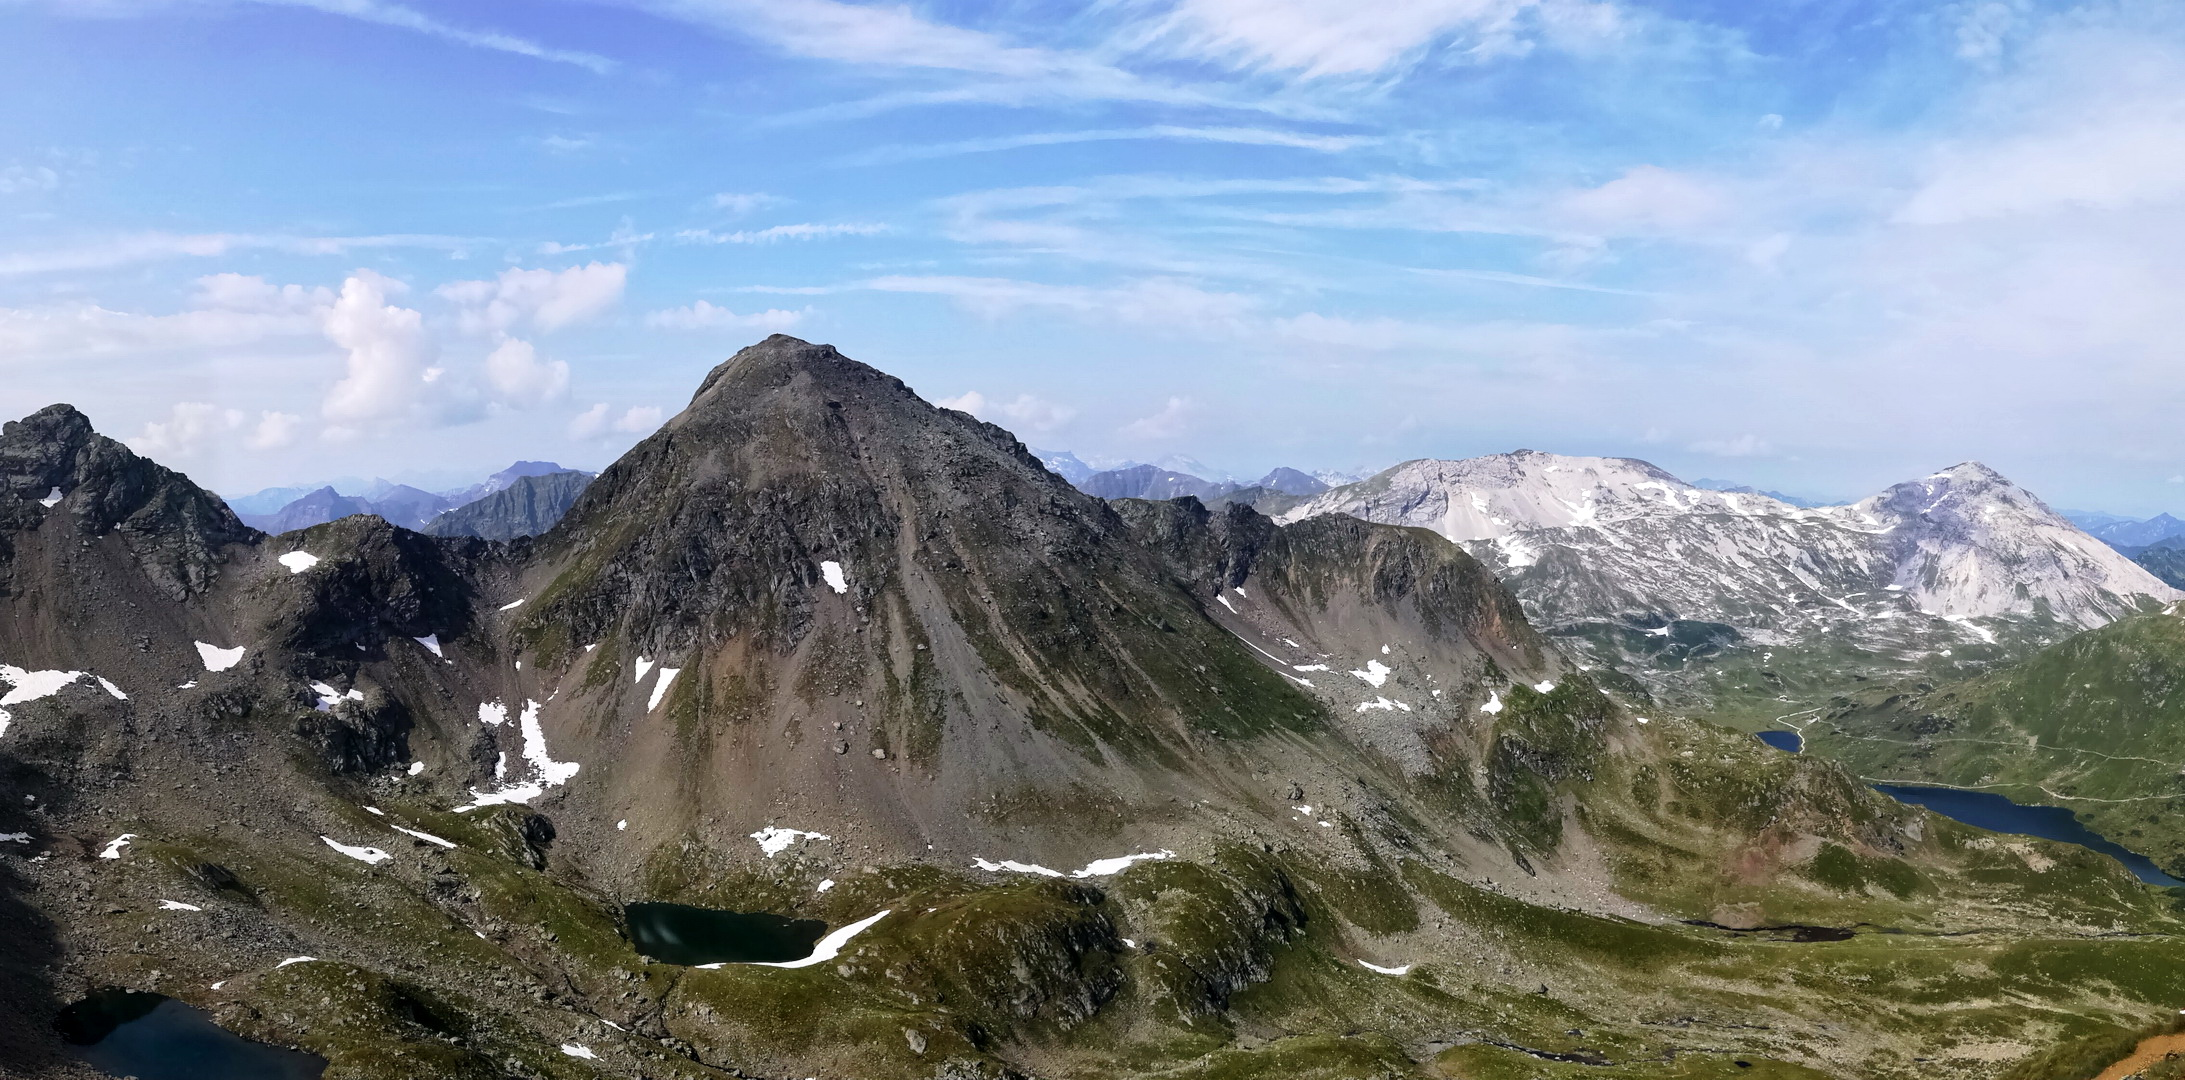 Engelkarspitze